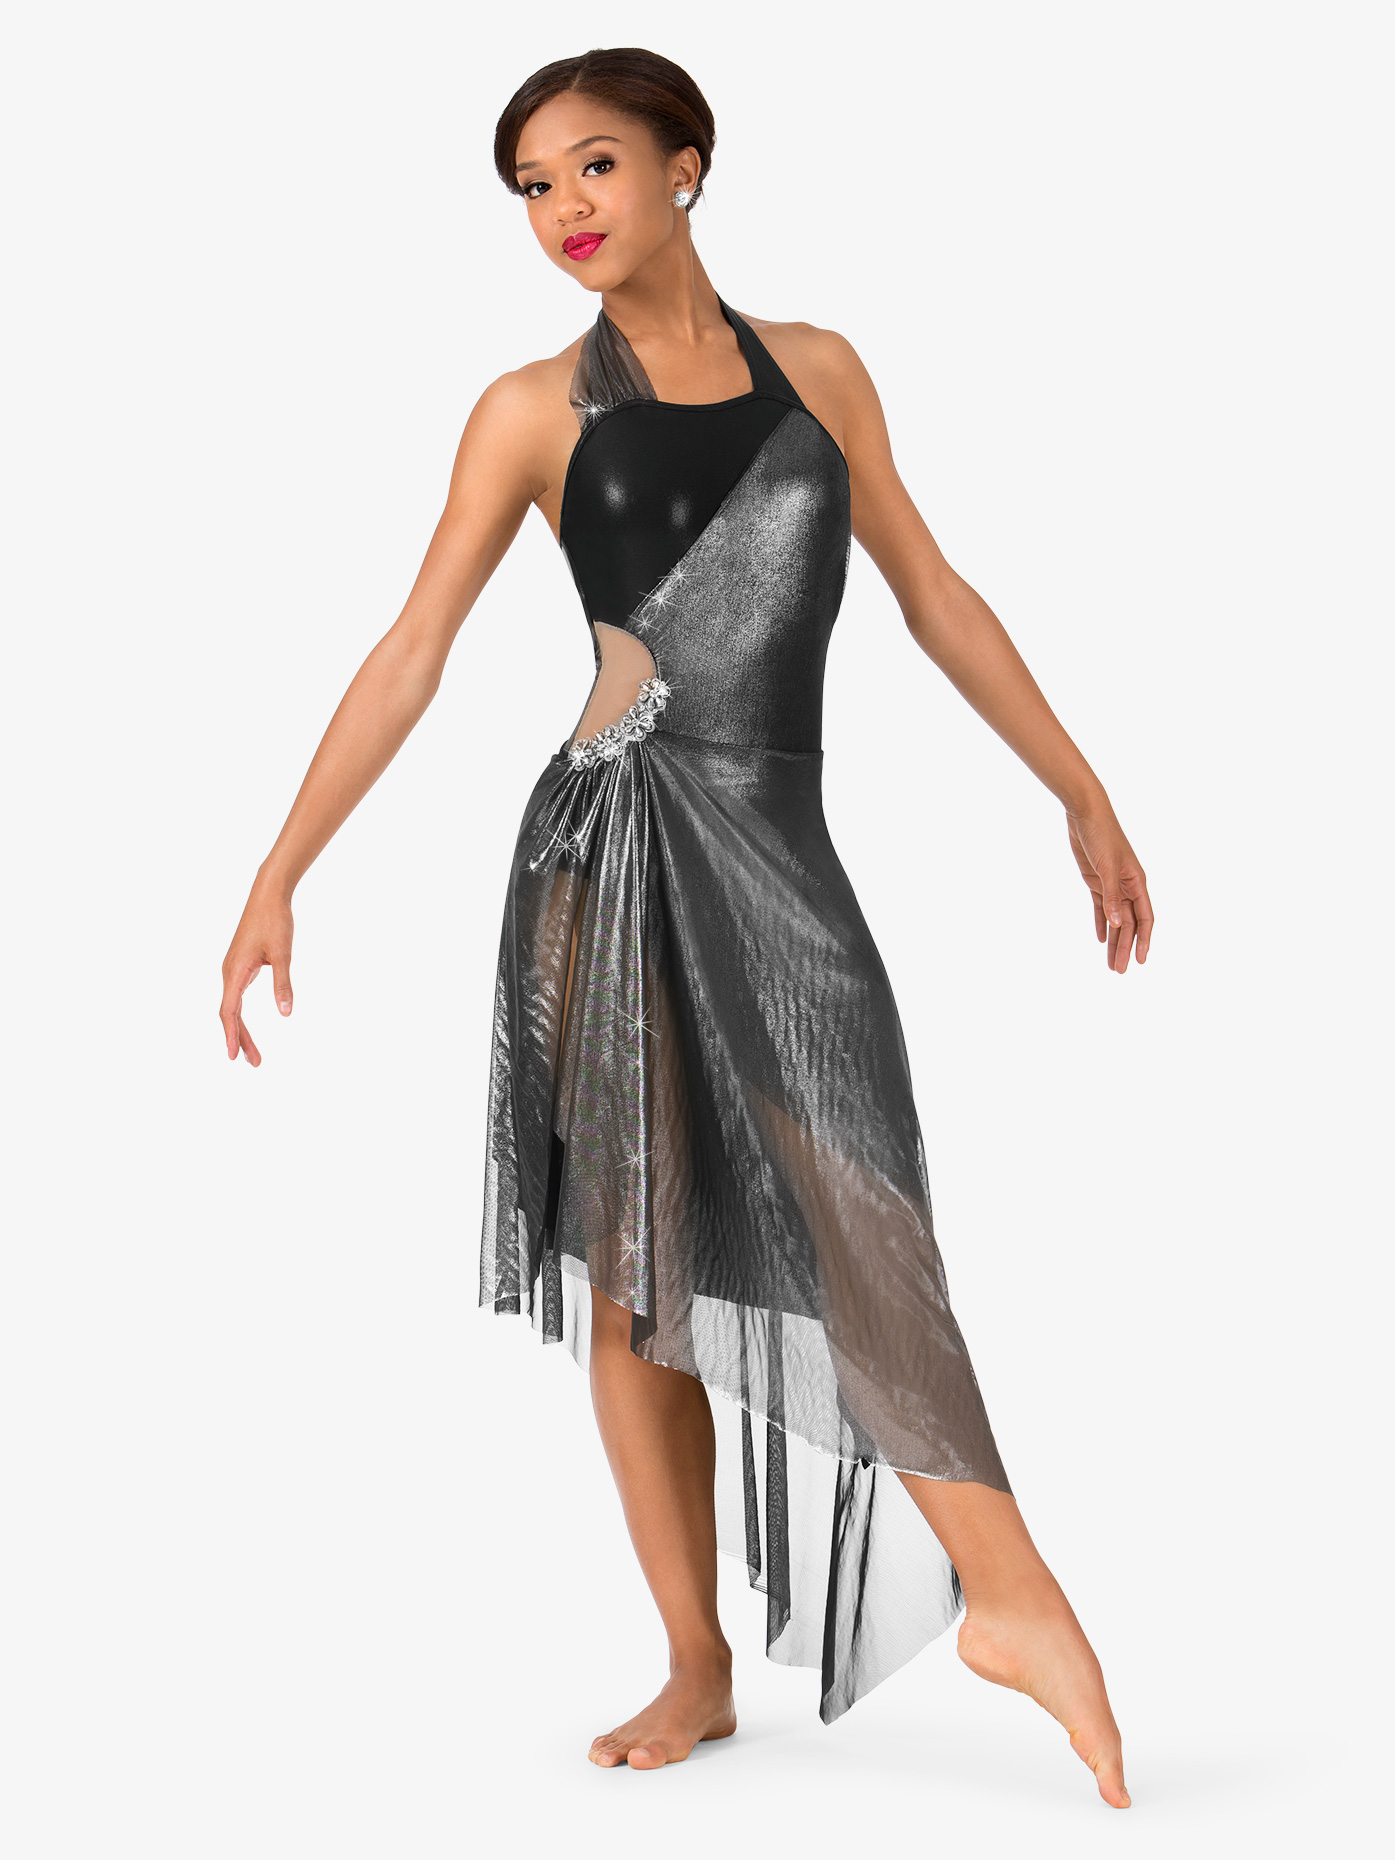 Elisse by Double Platinum Womens Metallic Asymmetrical Halter Performance Dress N7477